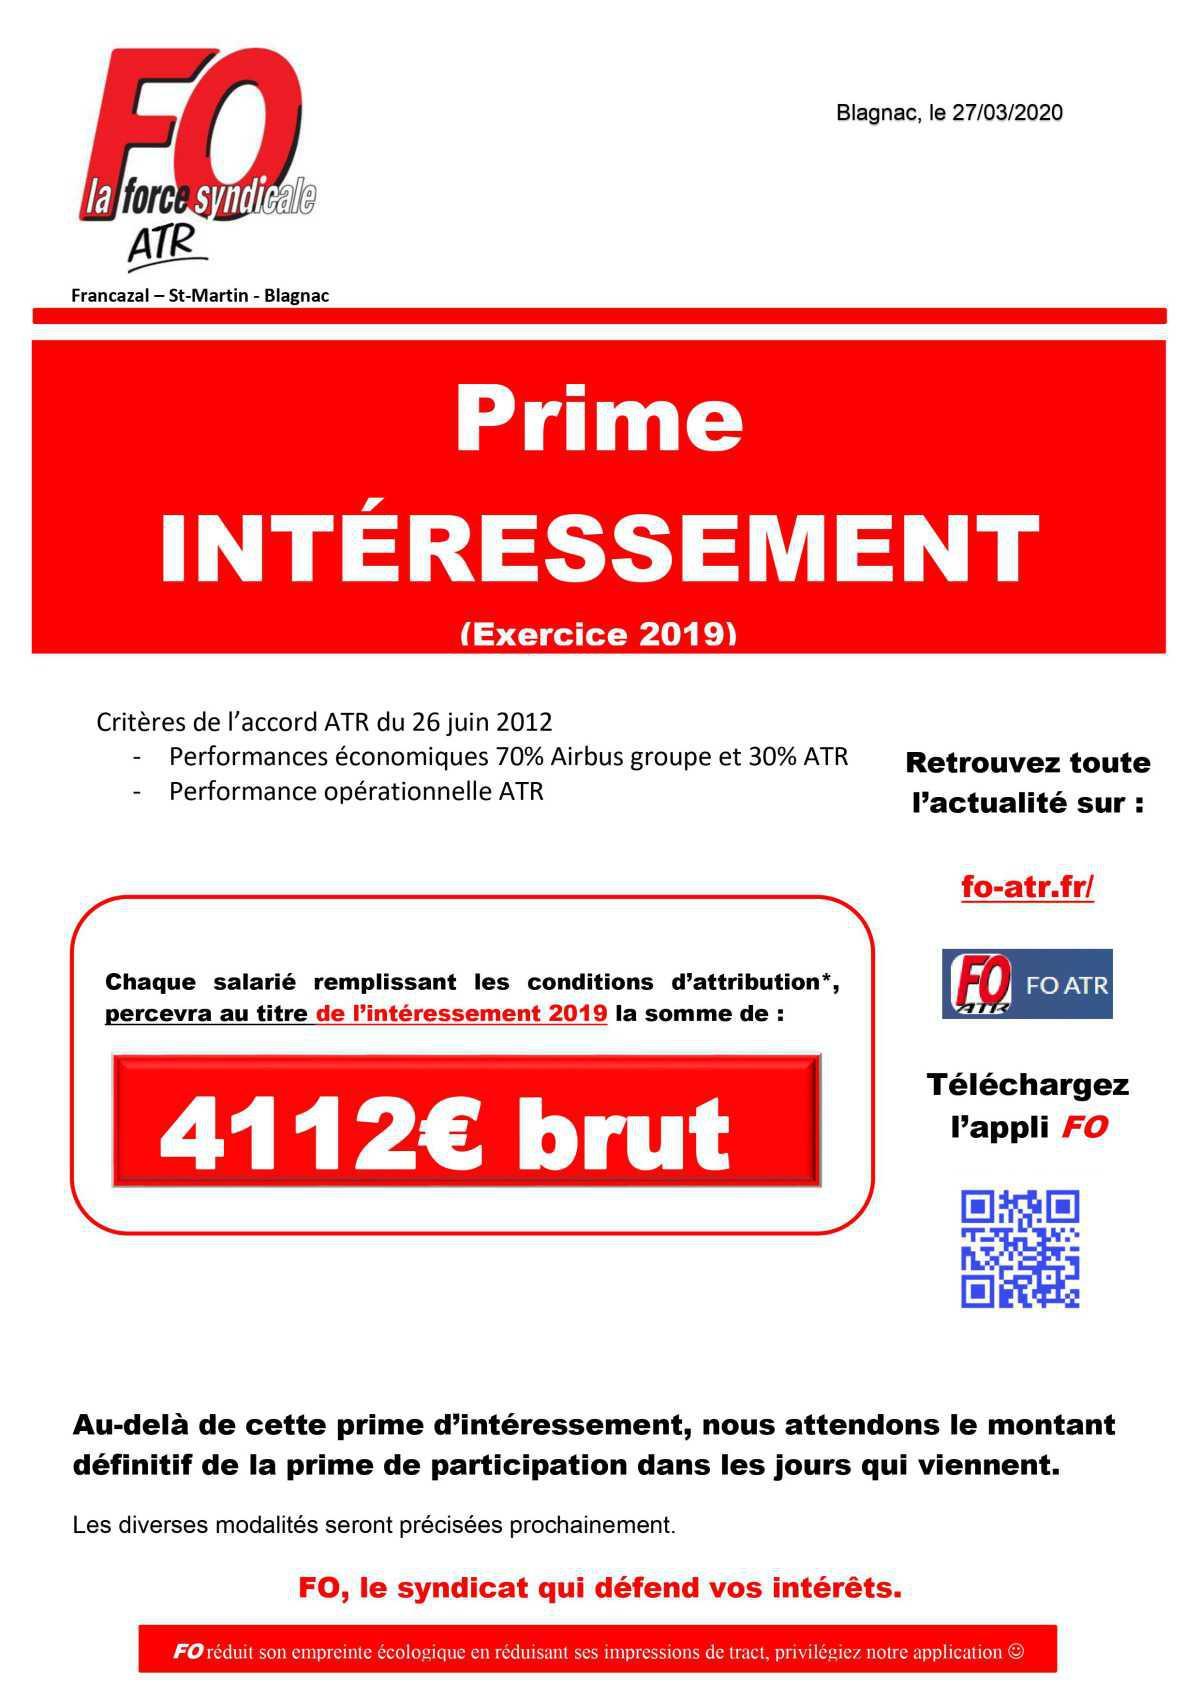 Intéressement 2020 (exercice 2019)